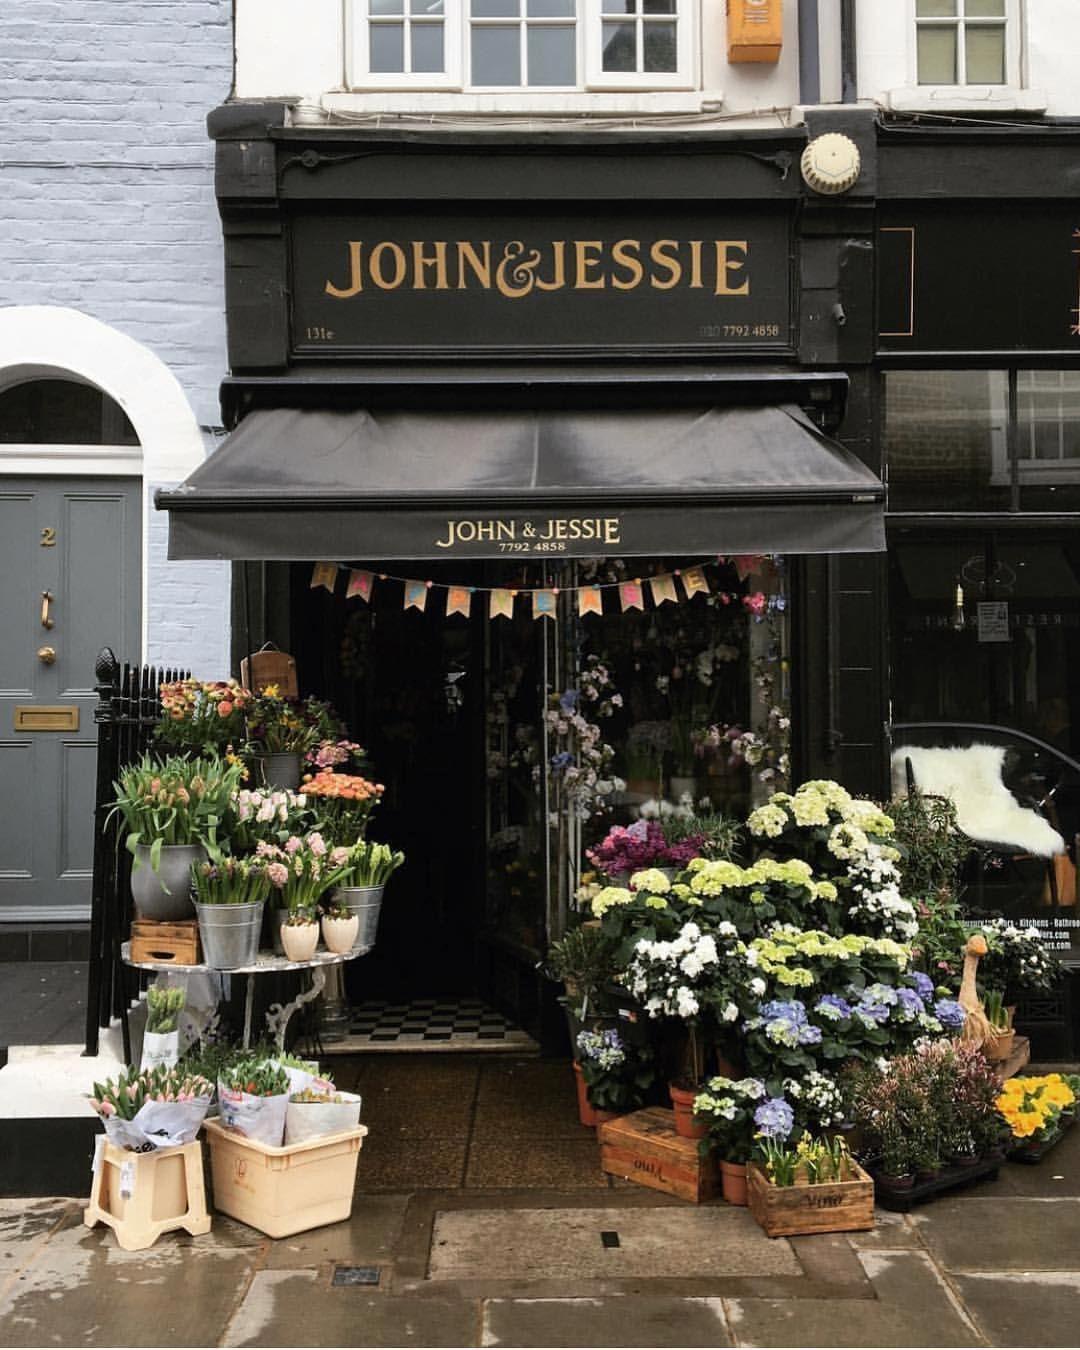 John Jessie Kensington Kelag Wanderlust Lovely London Flower Shop Vibes Off To The Easter Parade On 5th Avenue Shopfront